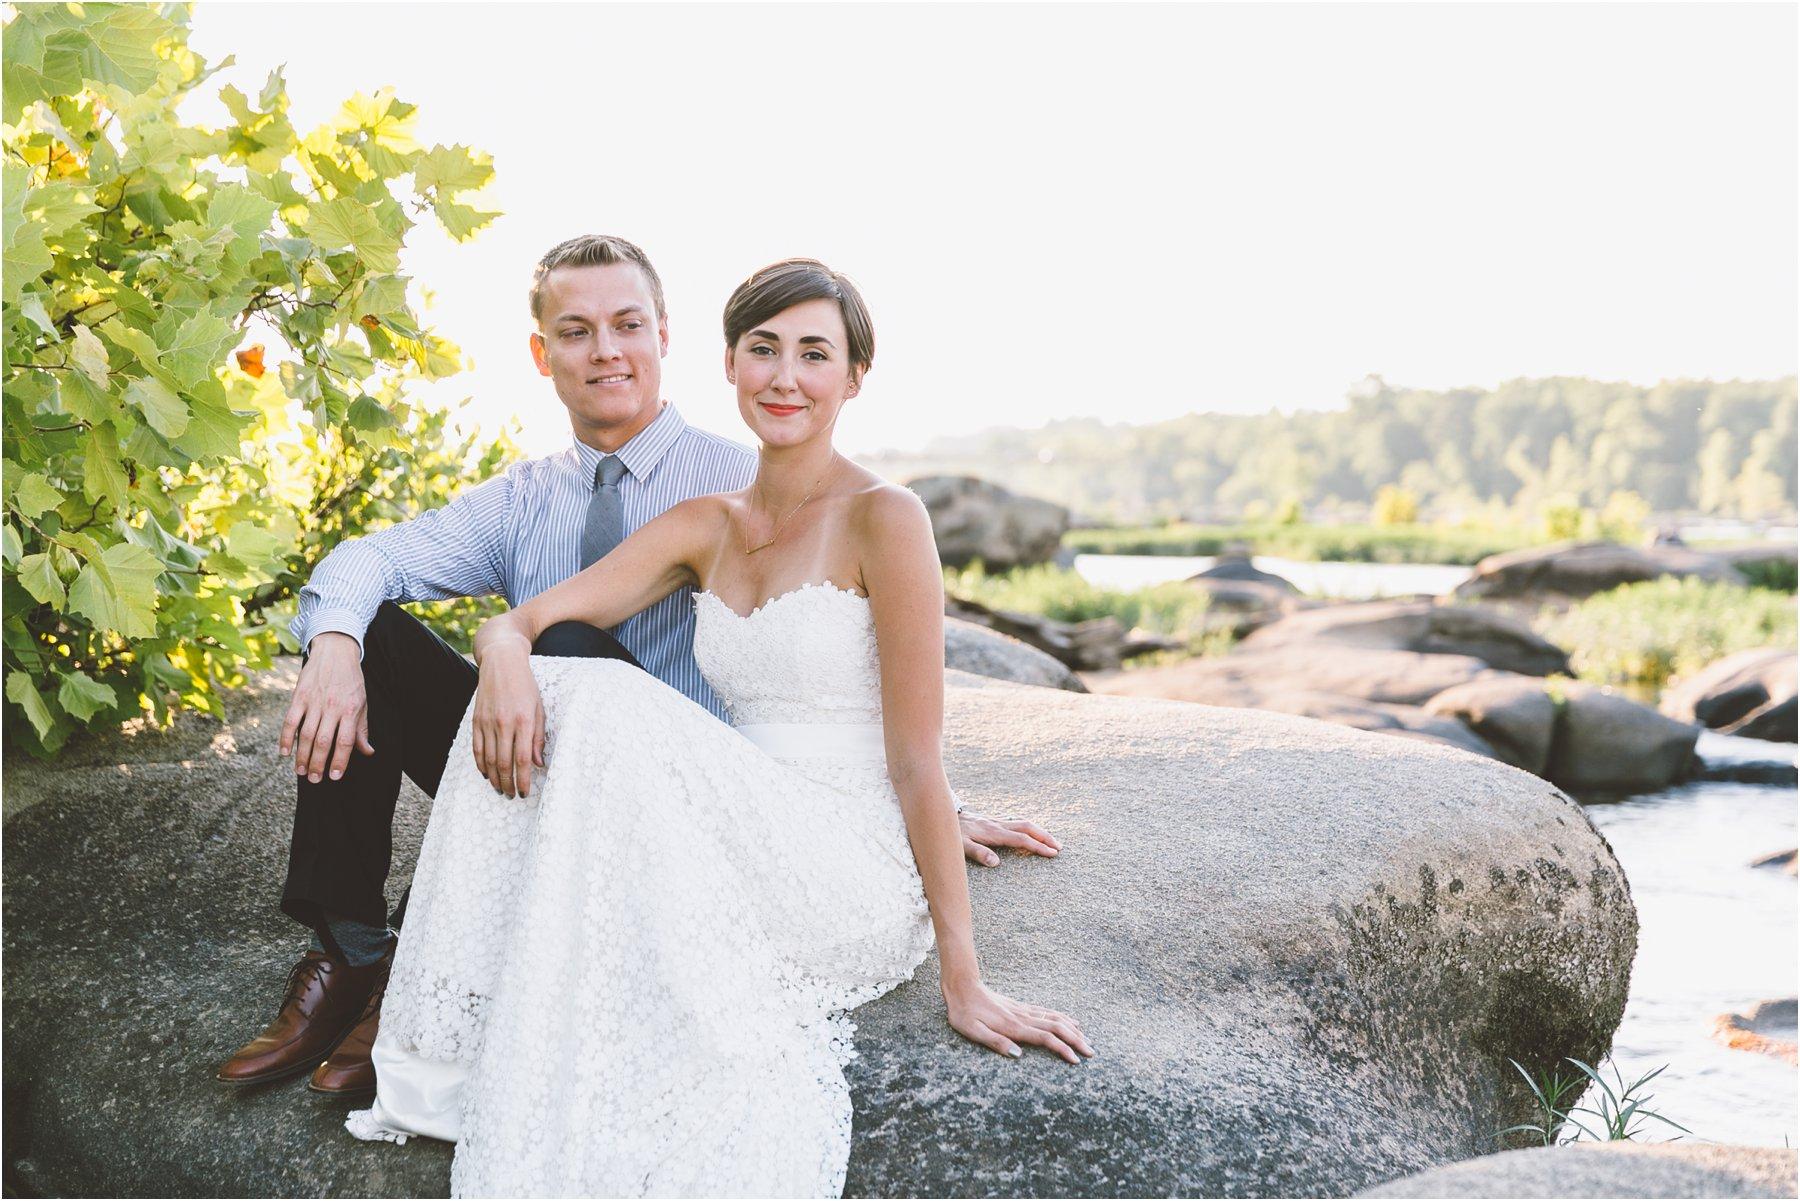 richmond_ wedding_belle_isle_Jessica_ryan_photography_0043